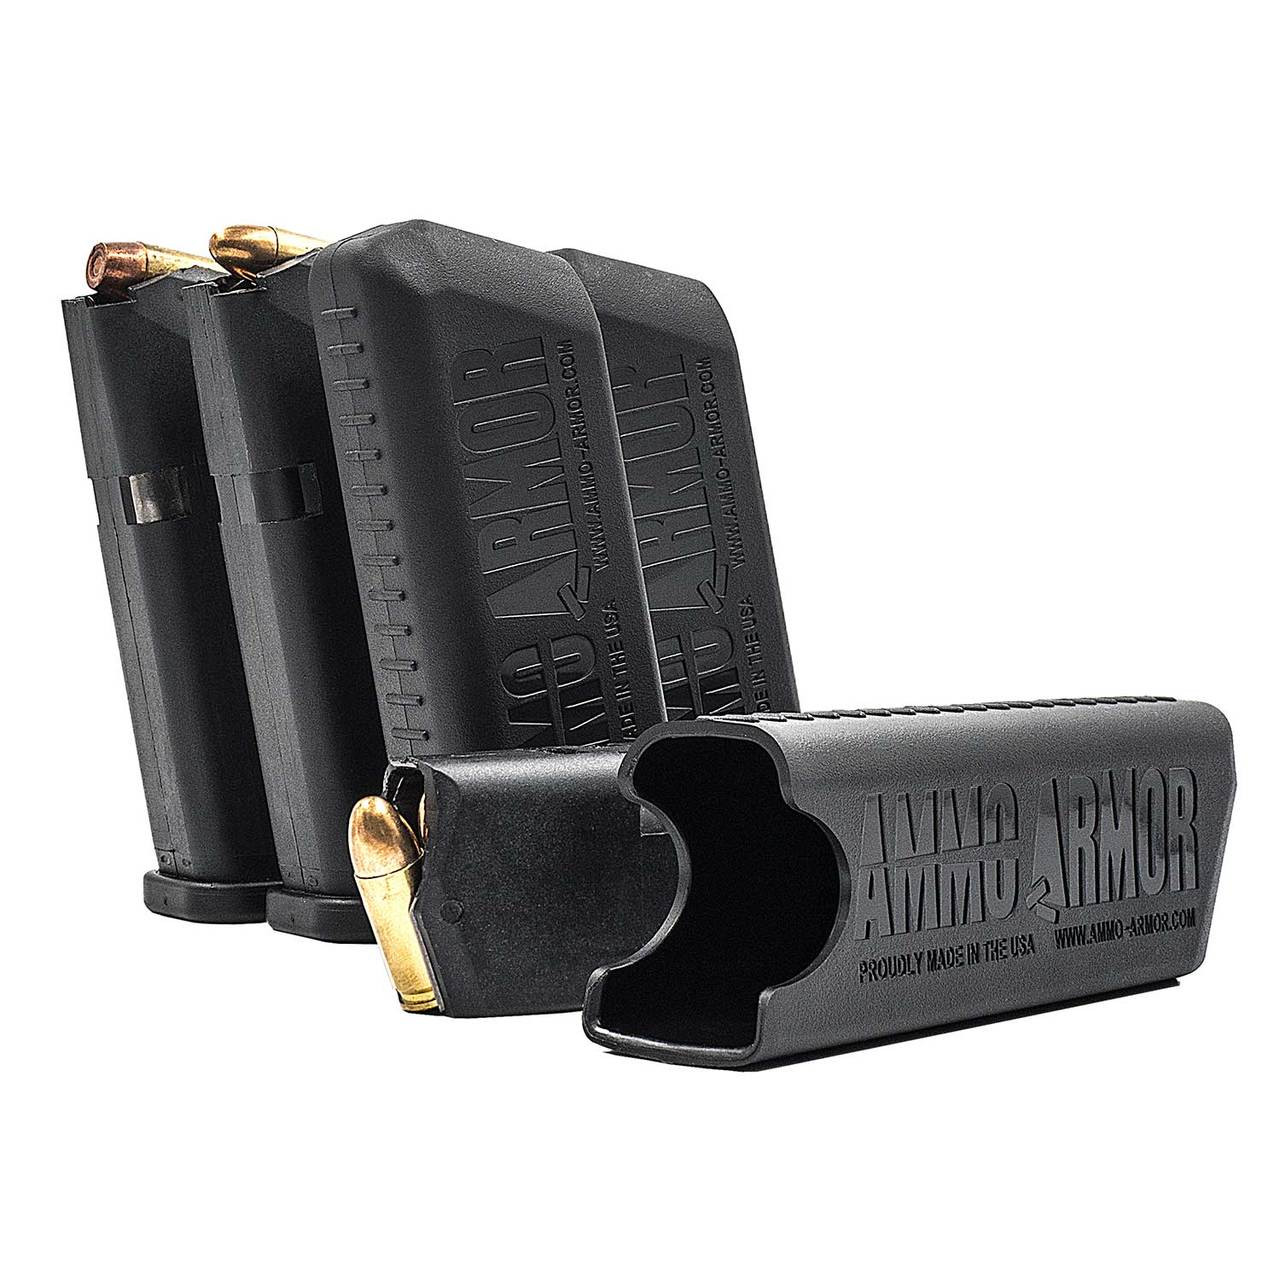 Glock 19 Ammo Armor